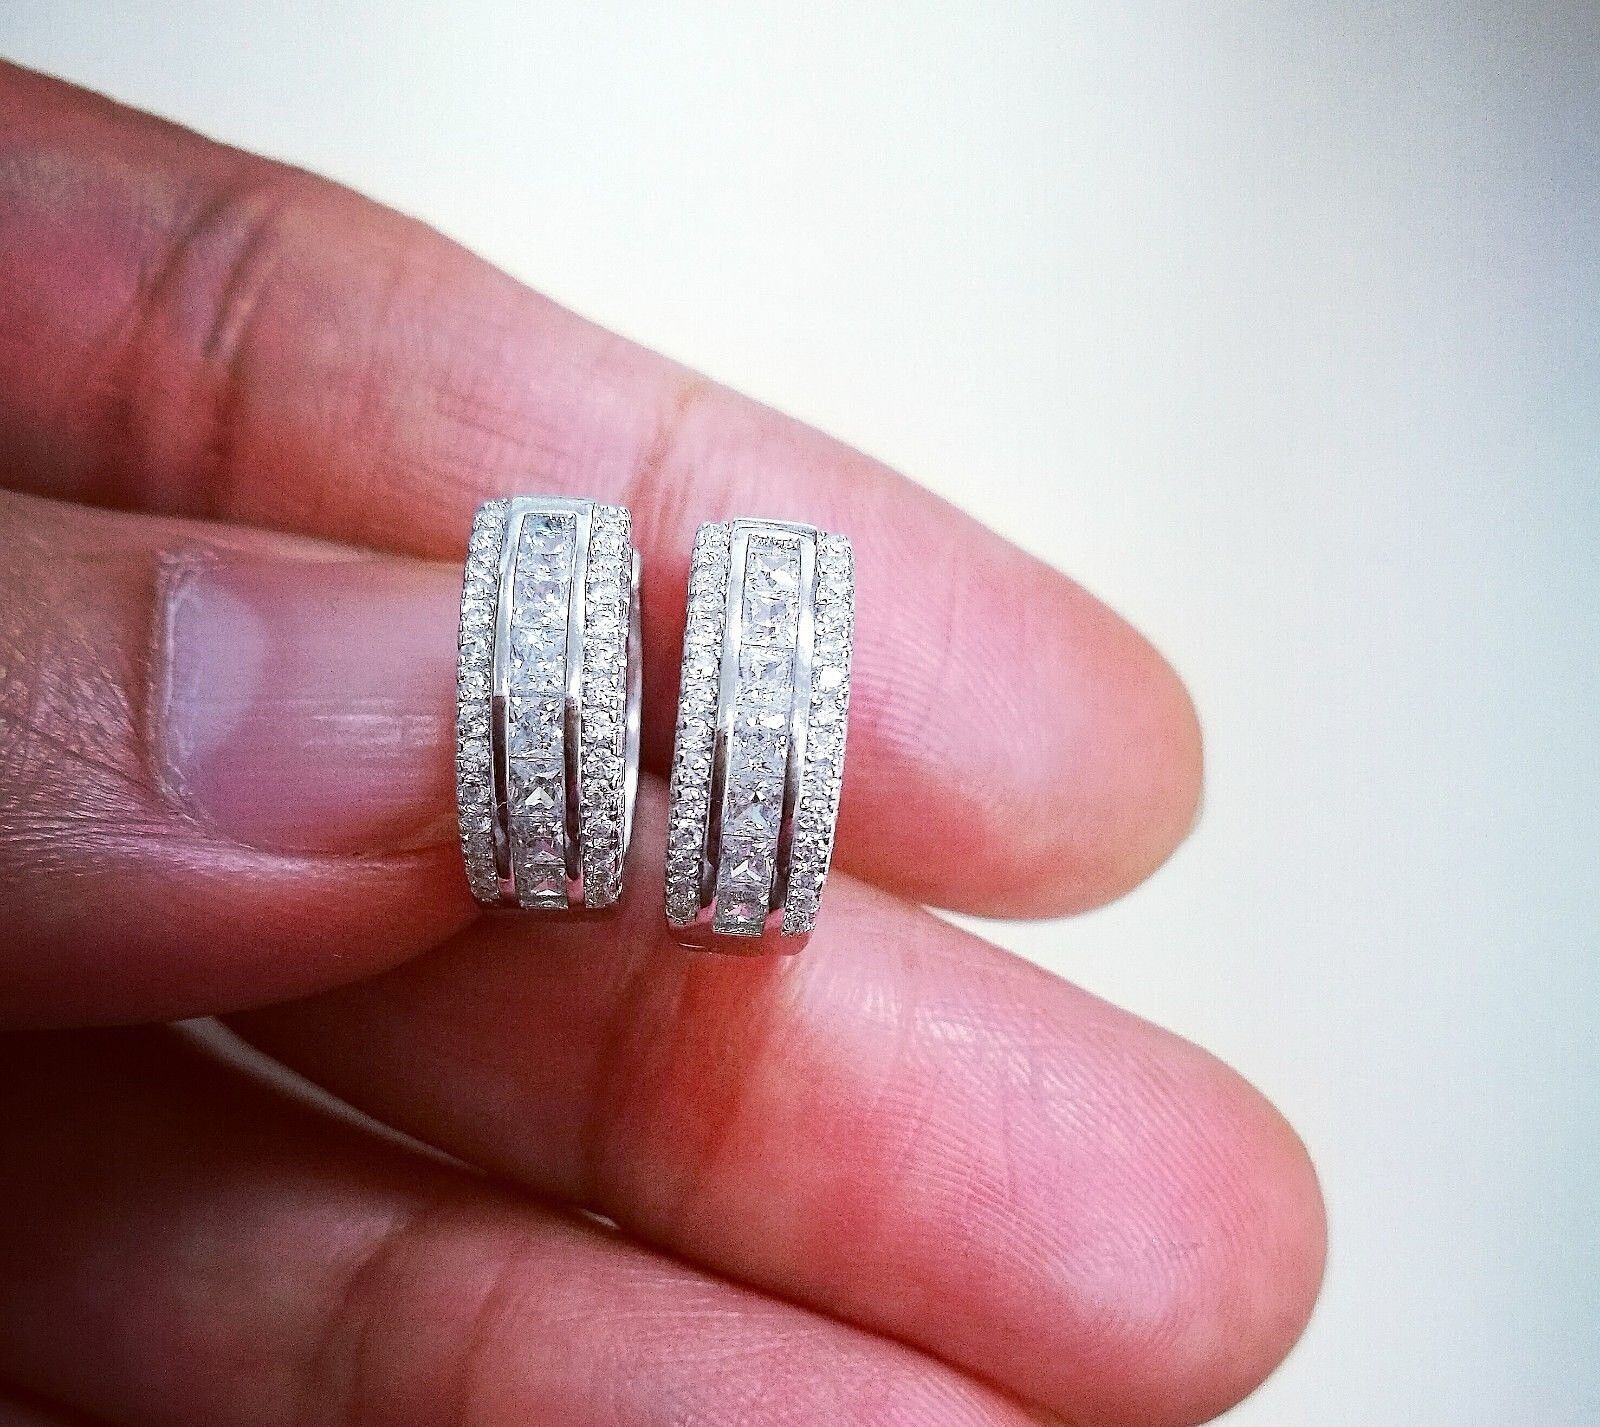 1 Ct Diamond Hoop Earrings Women Hoop Earrings 14K White Yellow Gold over 7